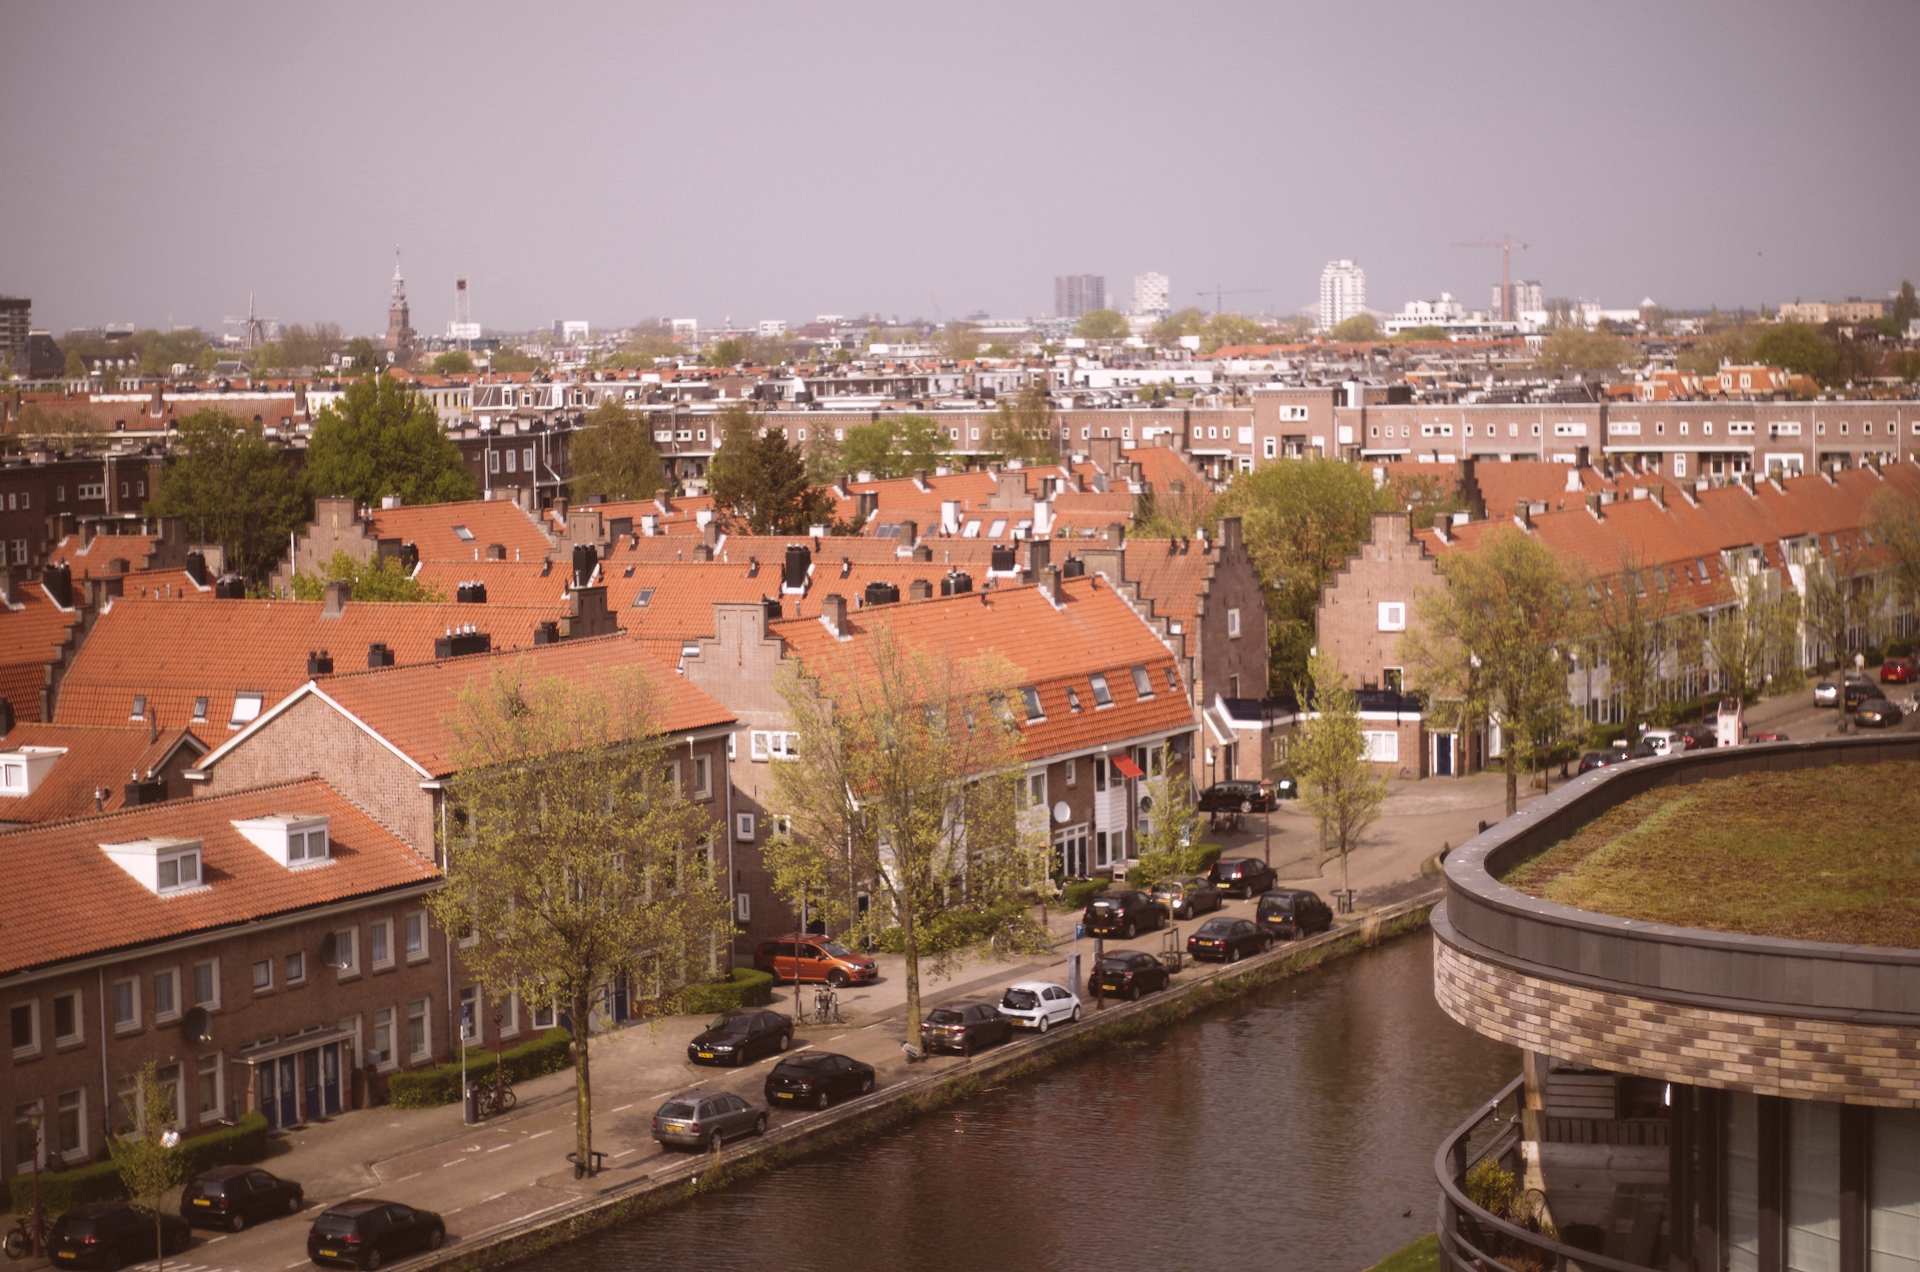 HOPP, Amsterdam